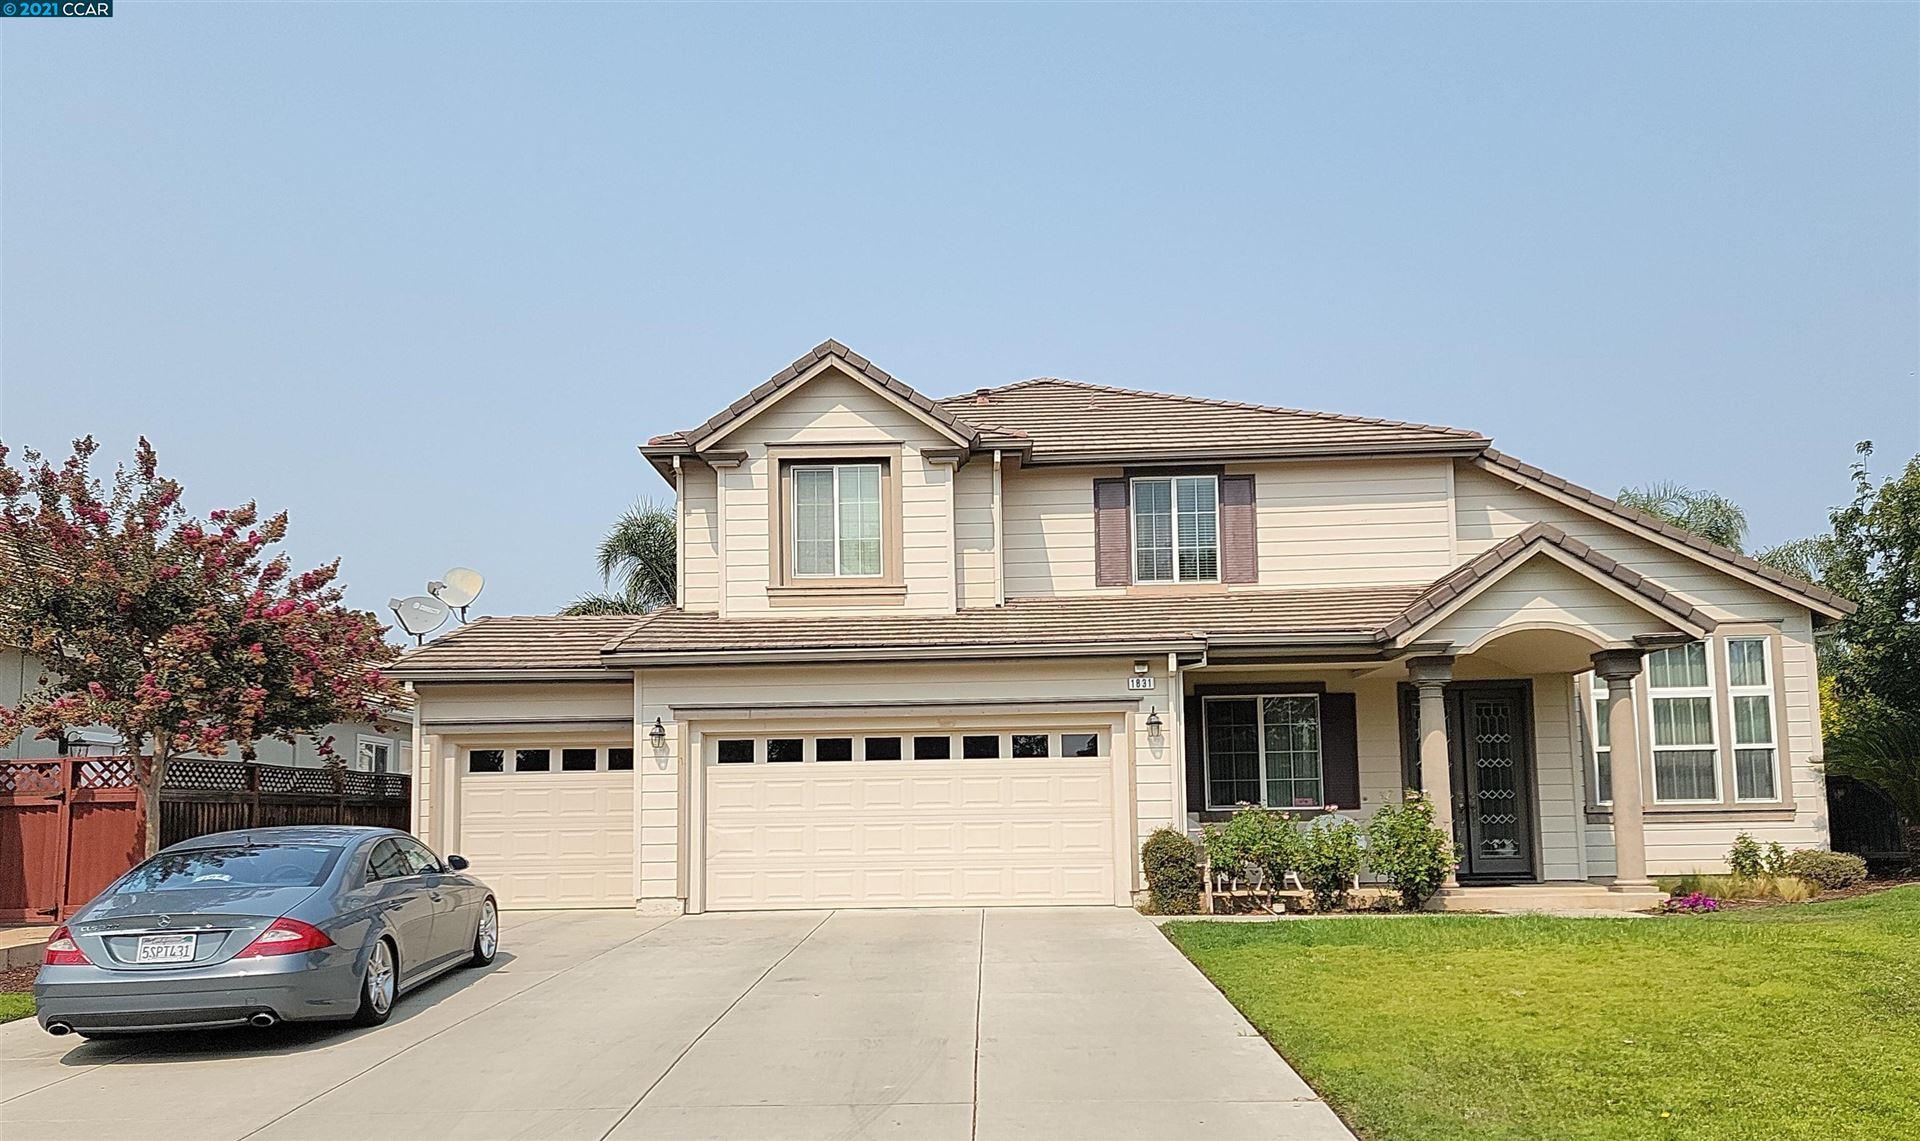 Photo of 1831 Elizabeth Way, Brentwood, CA 94513 (MLS # 40970513)